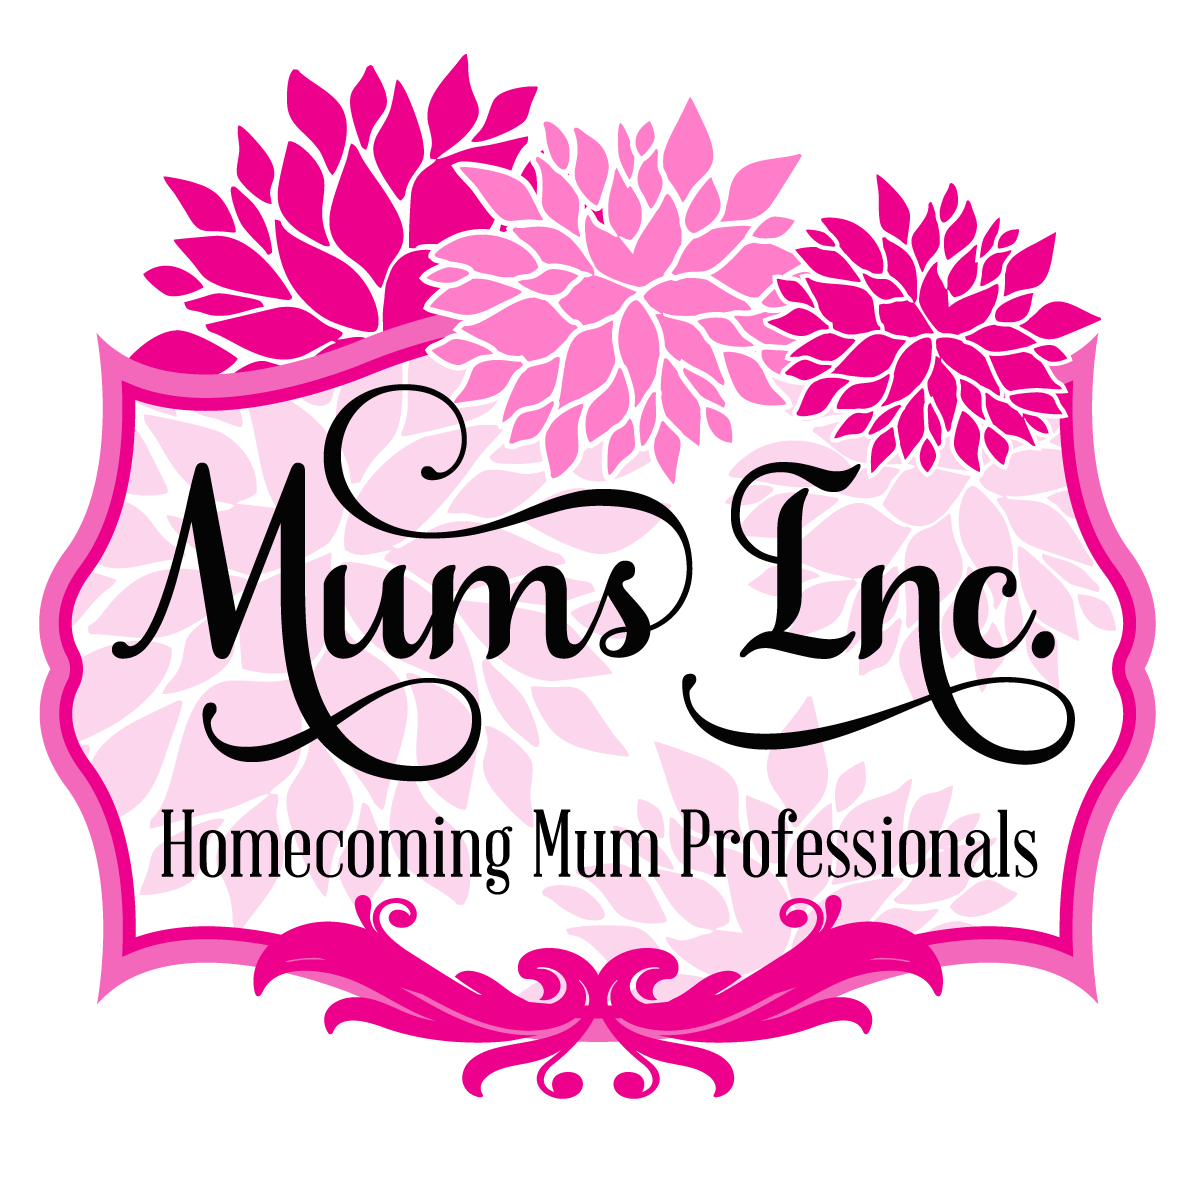 Mums Inc Homecoming Mum Professionals